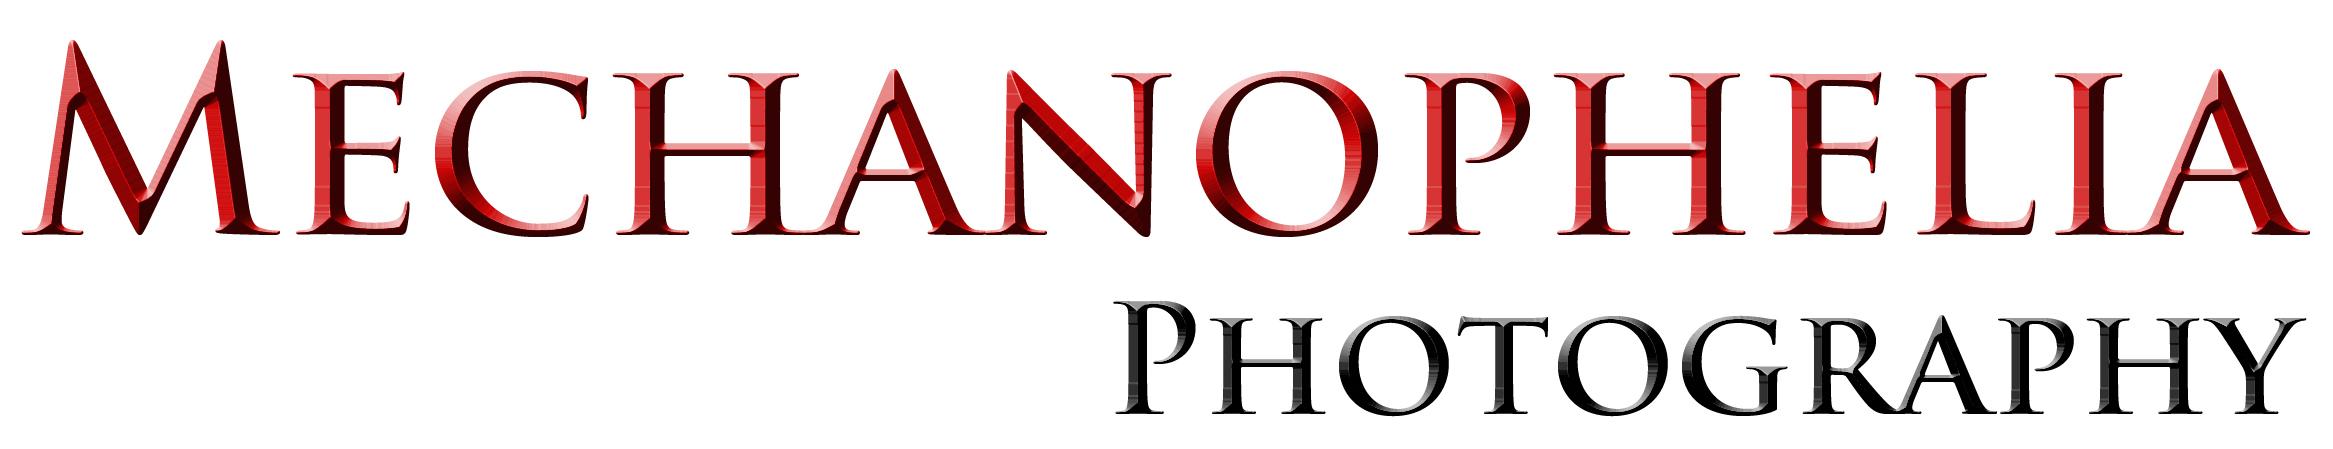 Mechanophelia Logo_Trajan_Pro